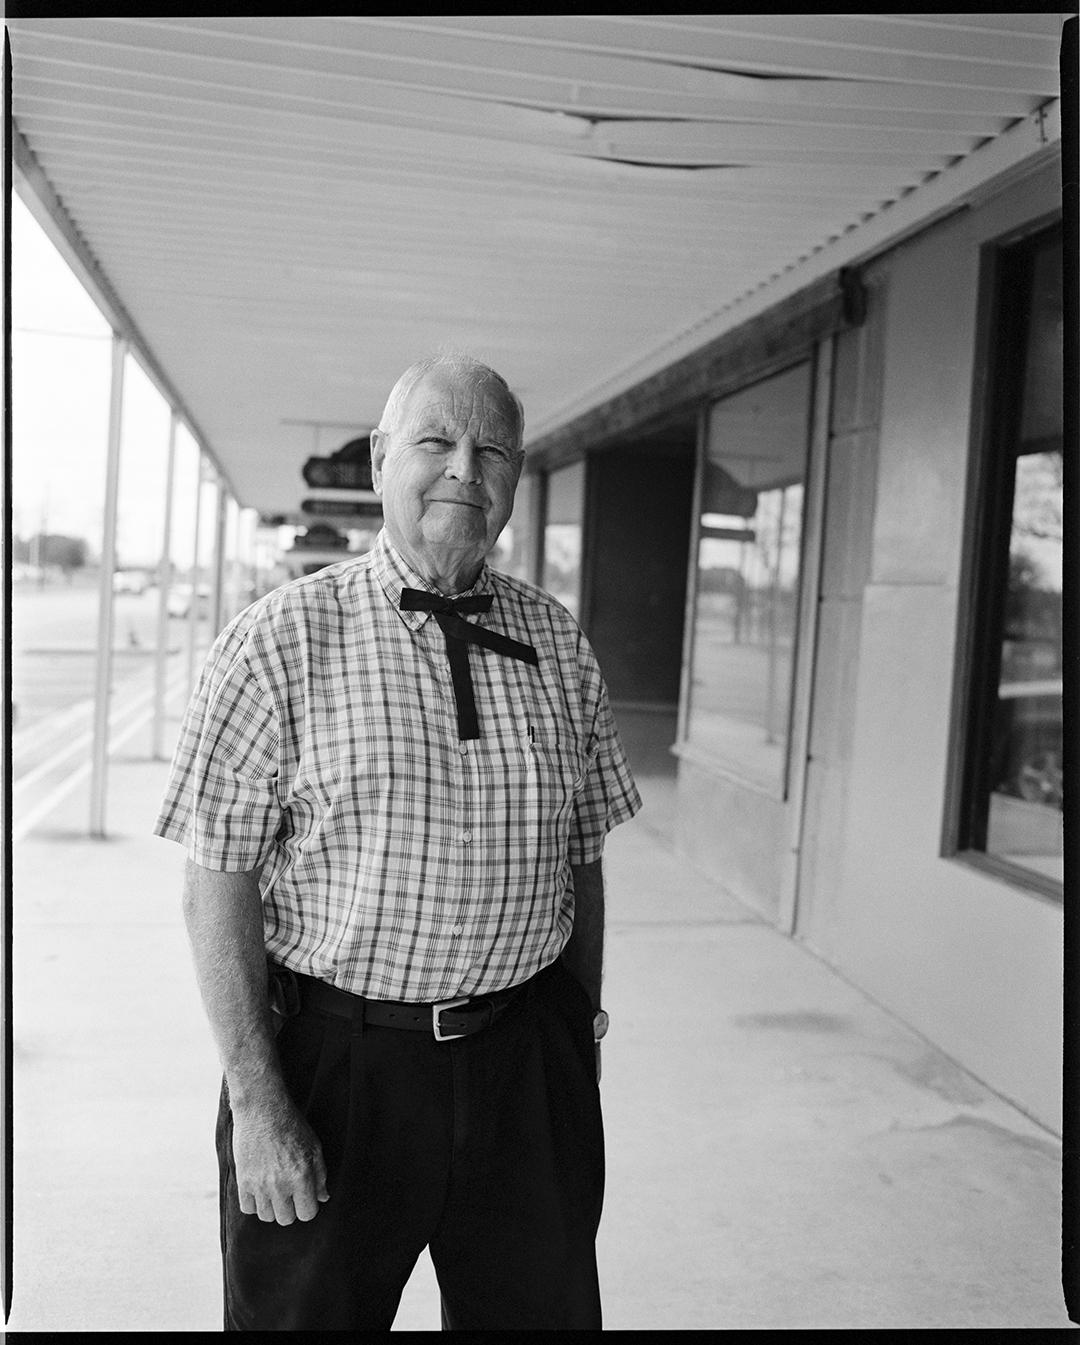 Man in western tie - Luling, TX, 2019 / Kodak TriX400 / 65mm lens at f5.6